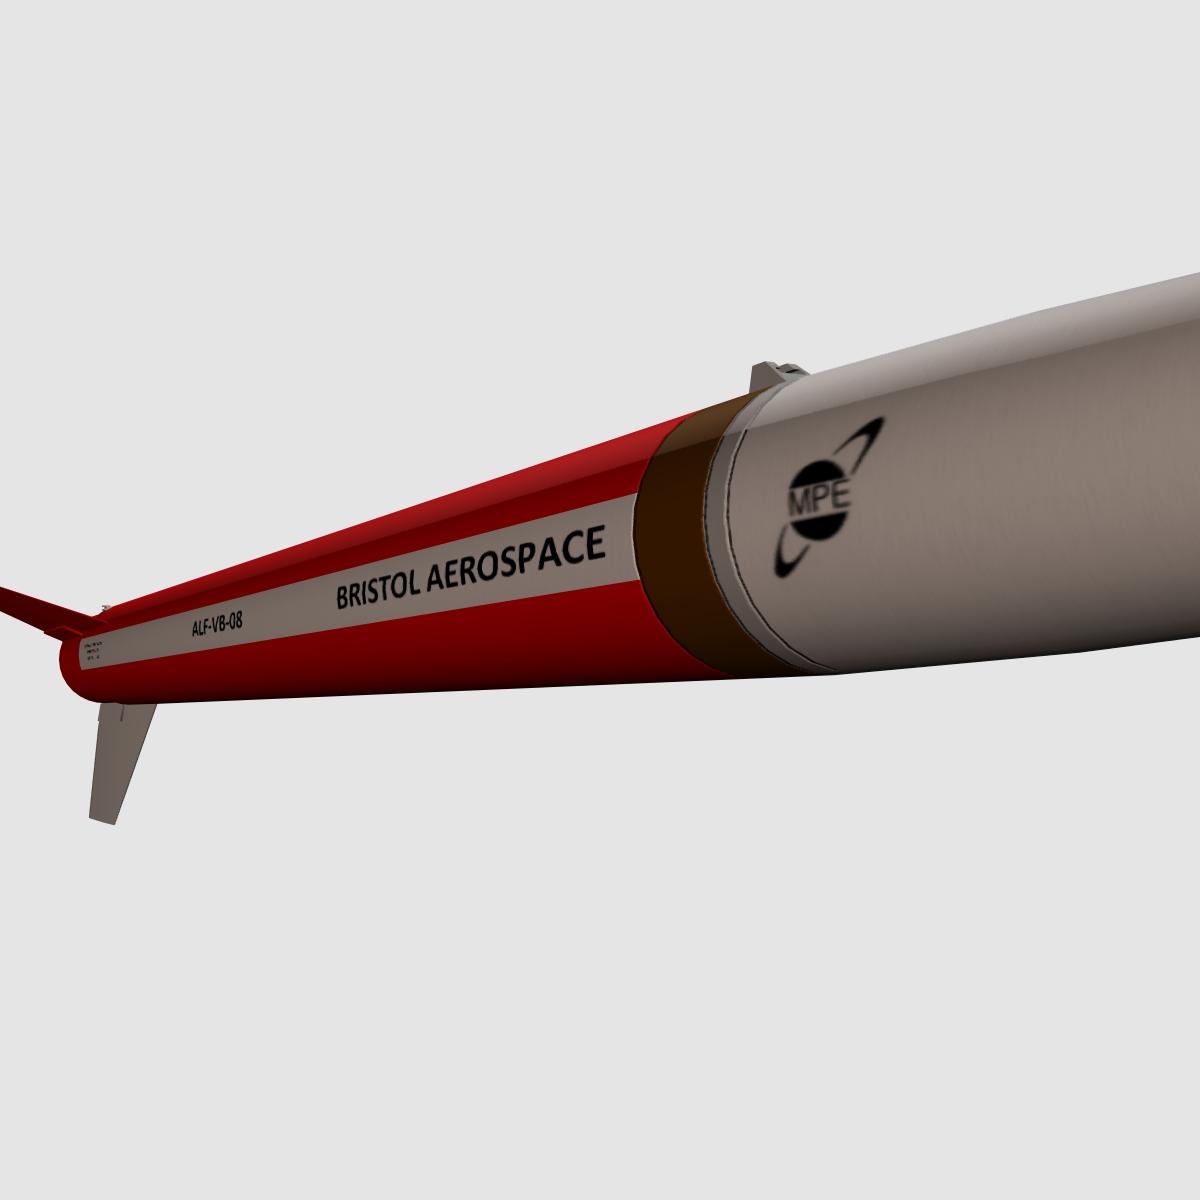 black brant vb sounding rocket 3d model 3ds dxf cob x obj 150875